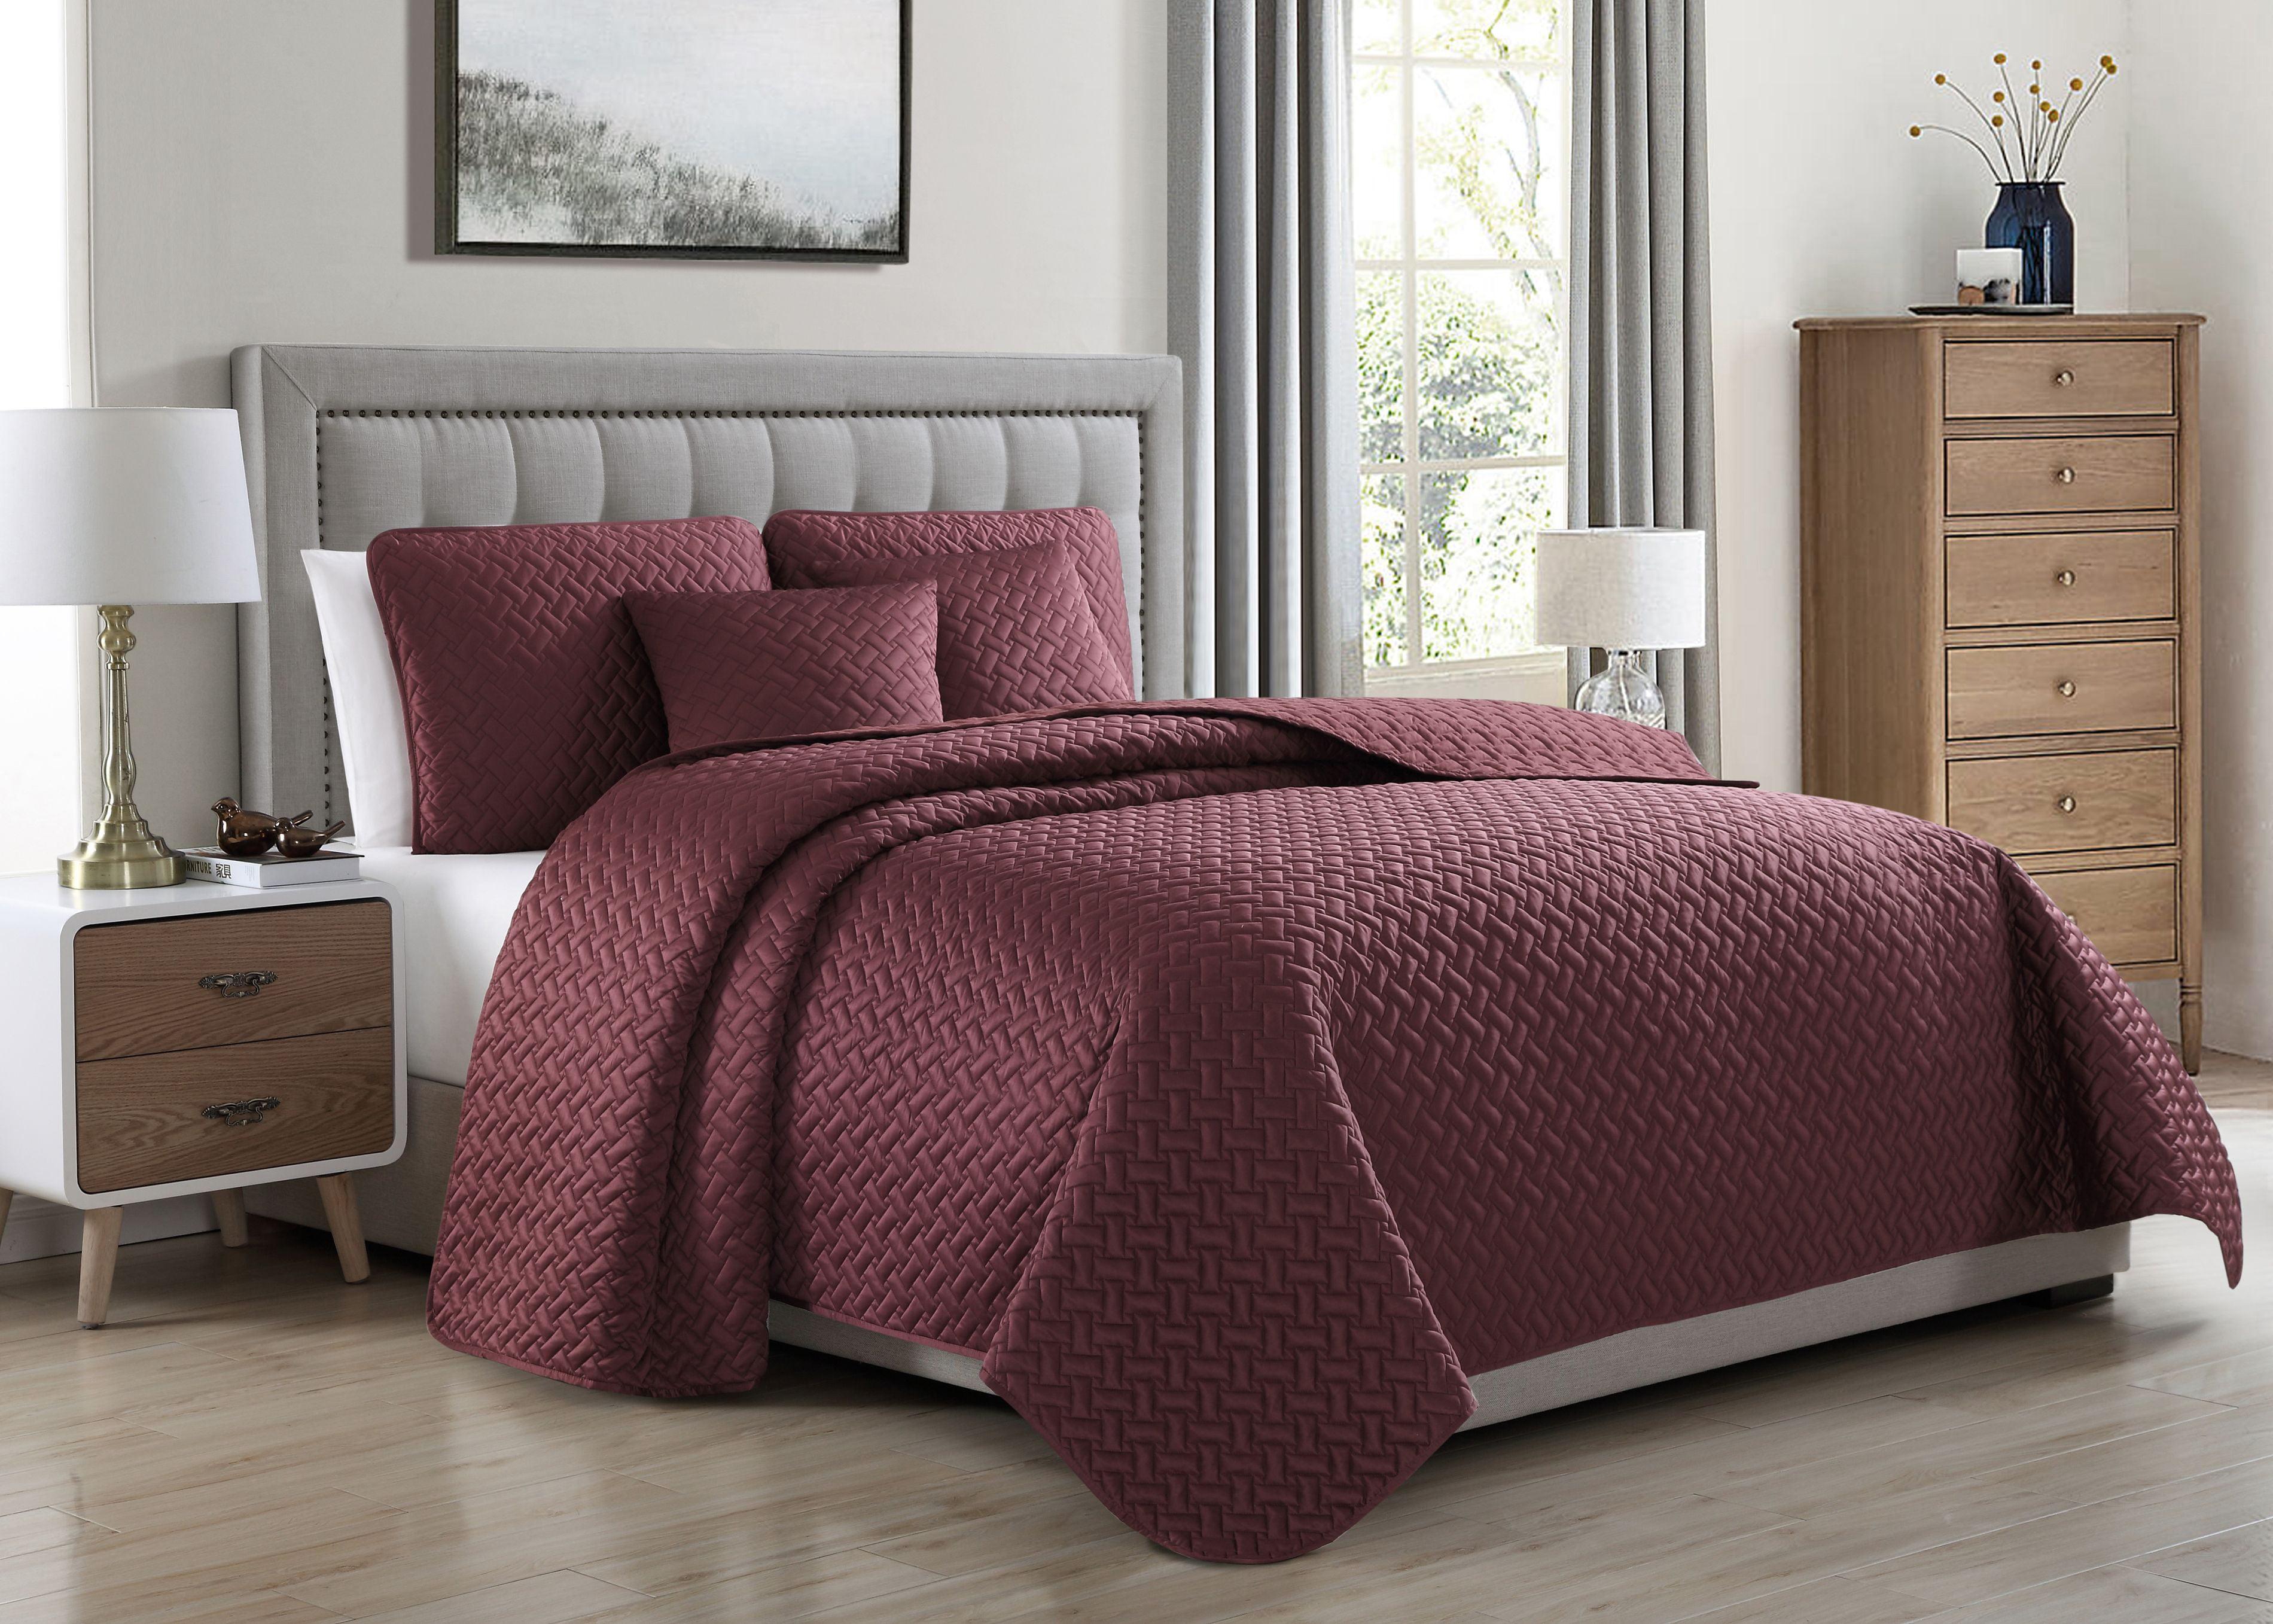 Cozy Beddings Francesco Quilted Coverlet Set Soft Satin Lightweight Geometric Pattern | Burgundy by BH&B International Inc.